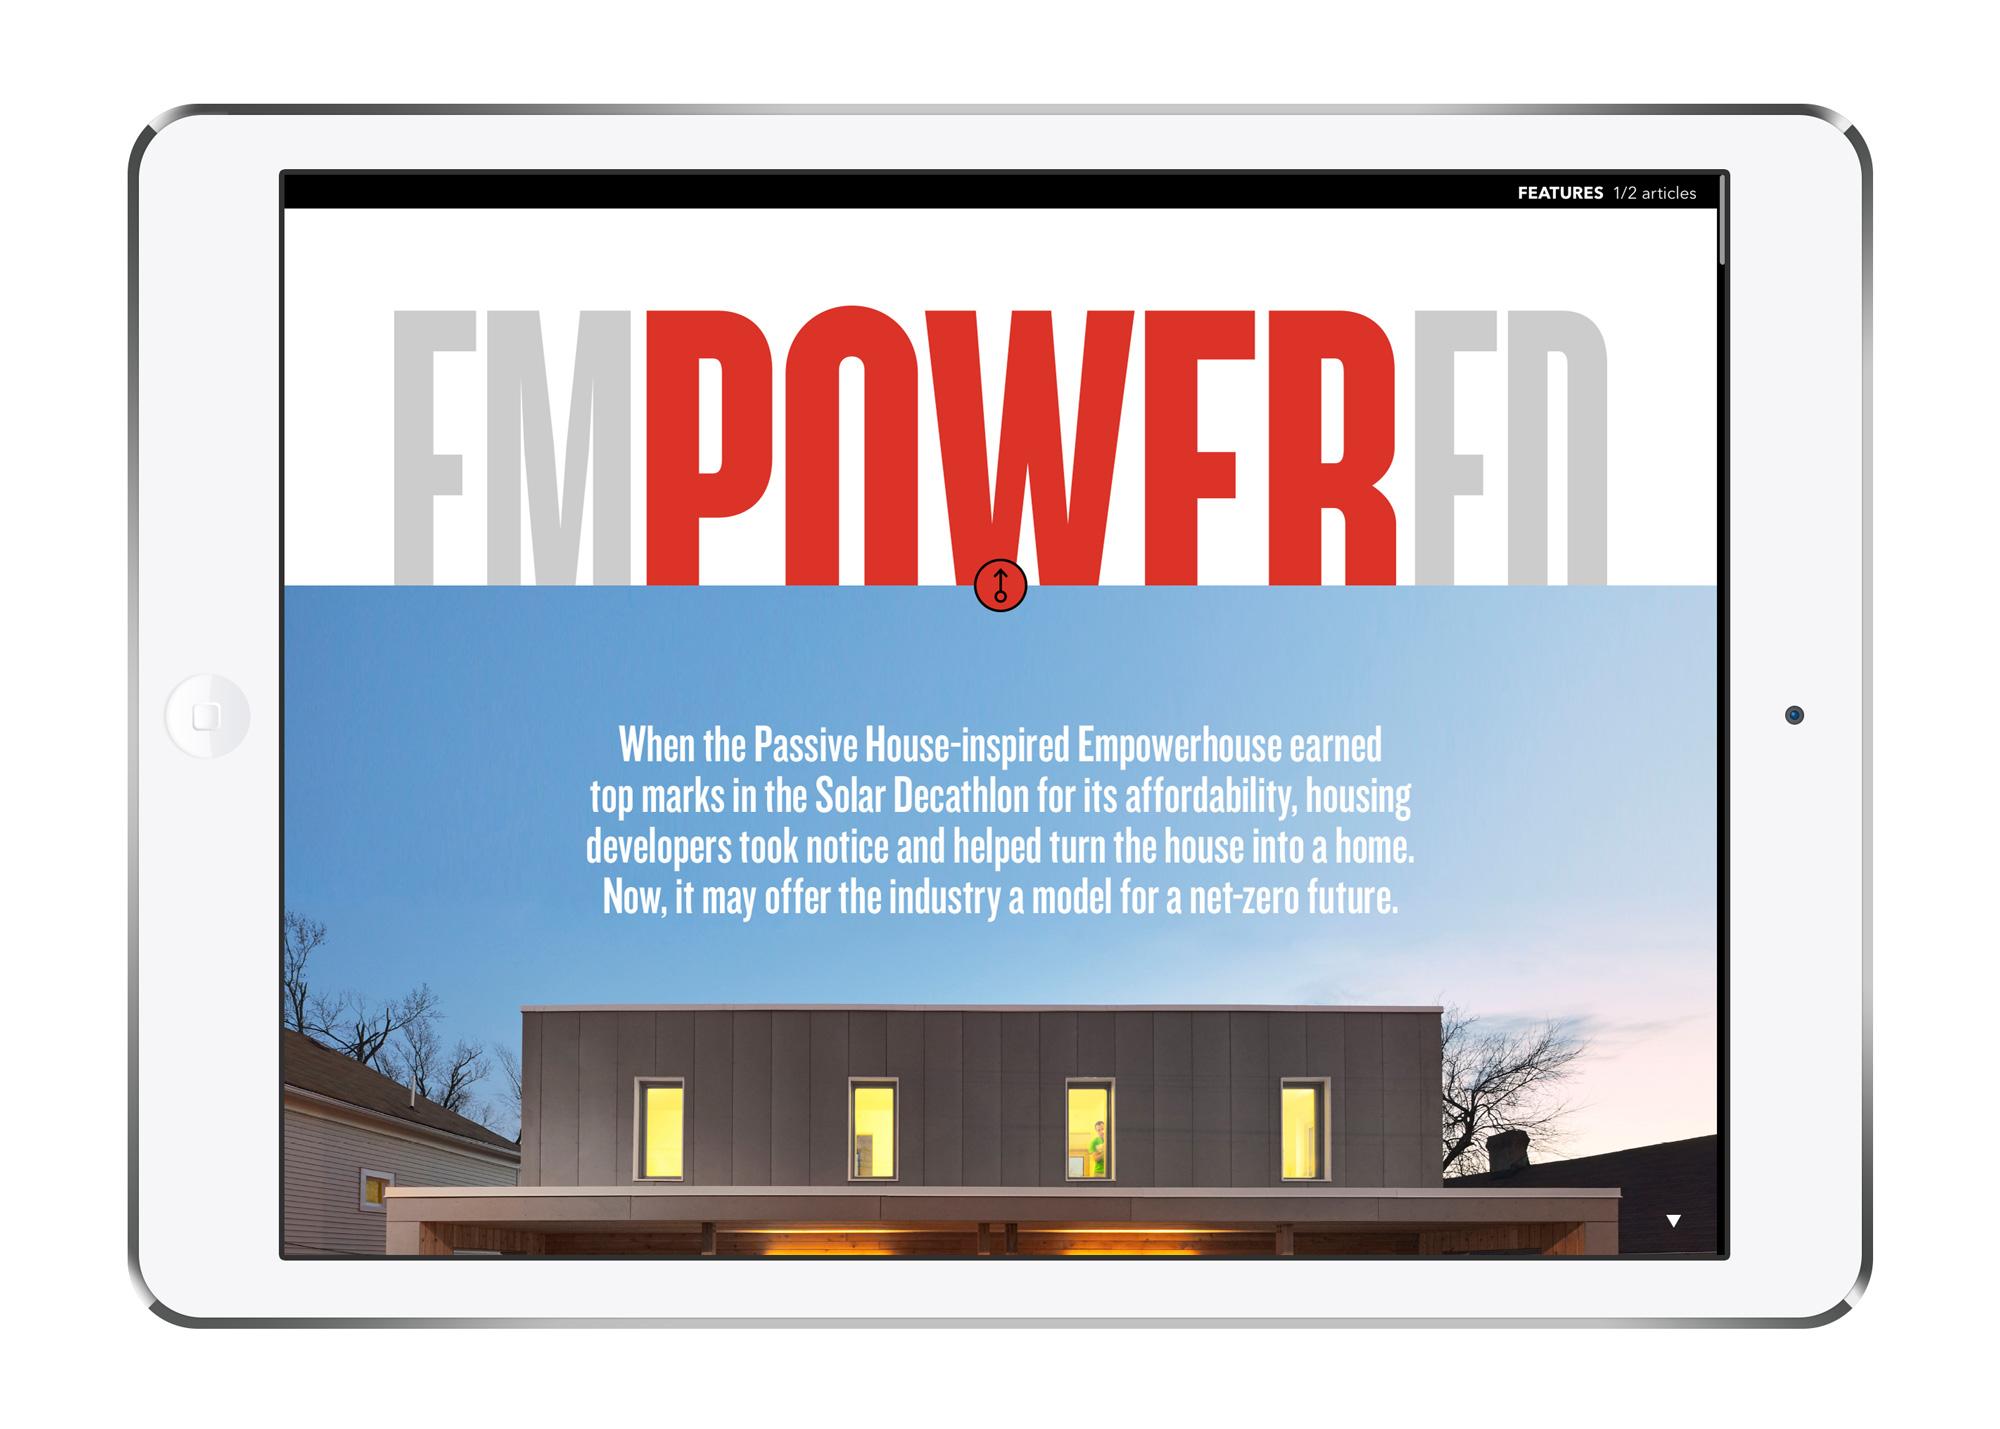 GBD_iPad_Feature-Empower-2.jpg